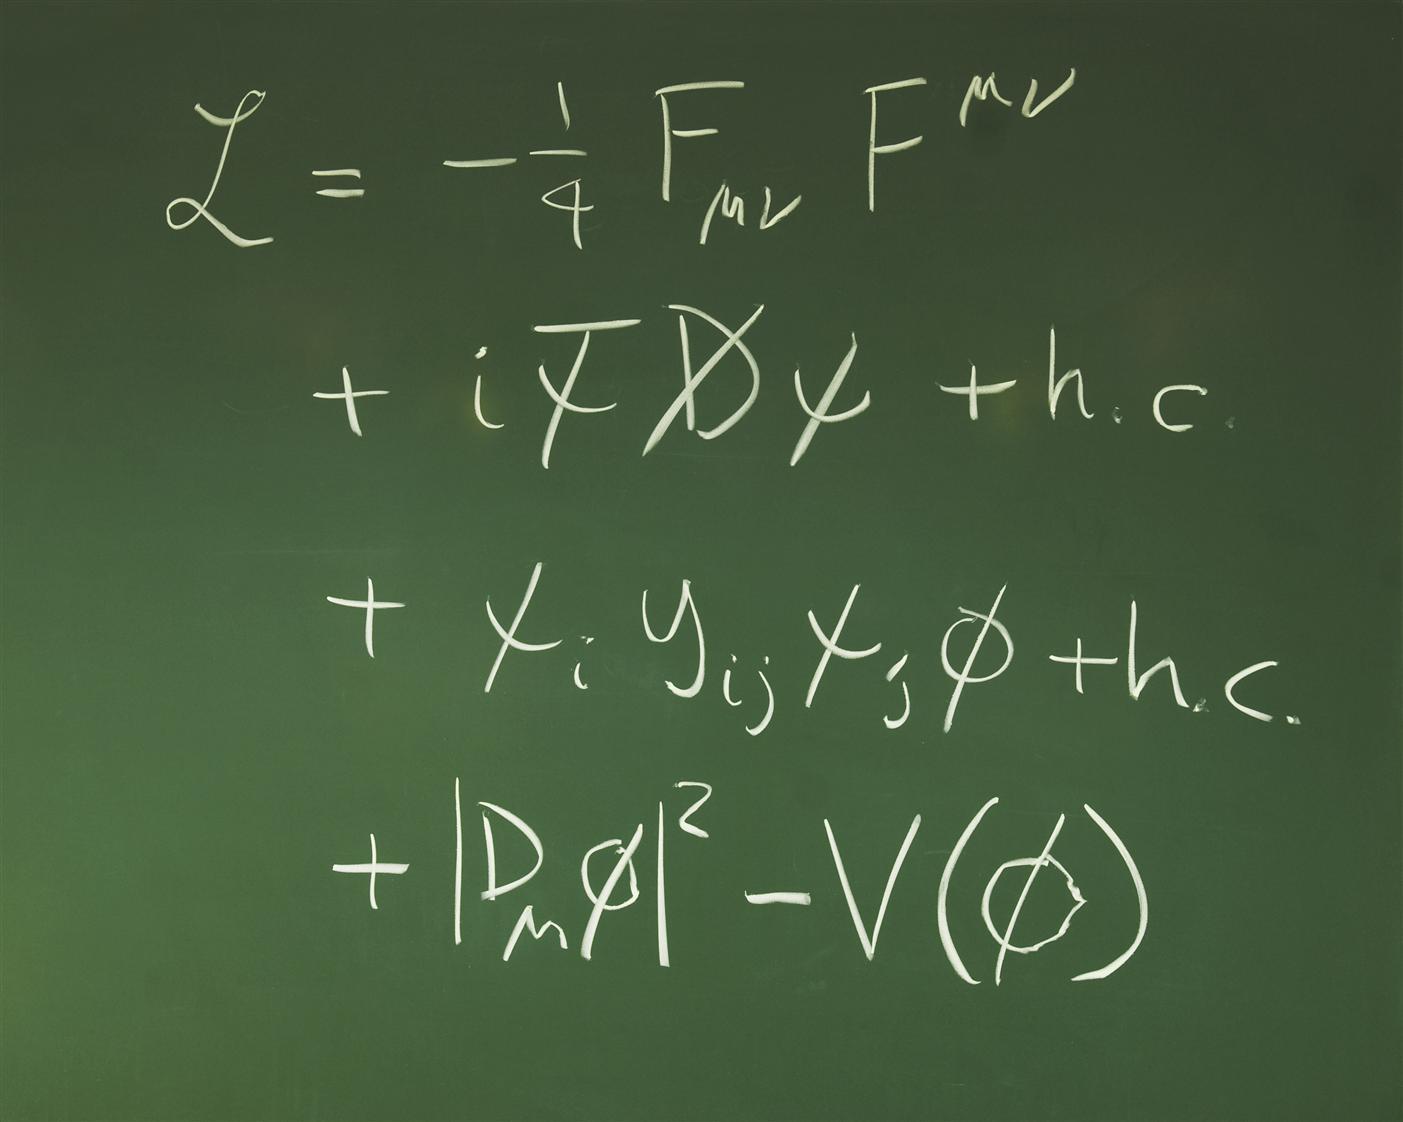 ALEPH, John Ellis, Lagrangian, Higgs, Penguin, διάγραμμα